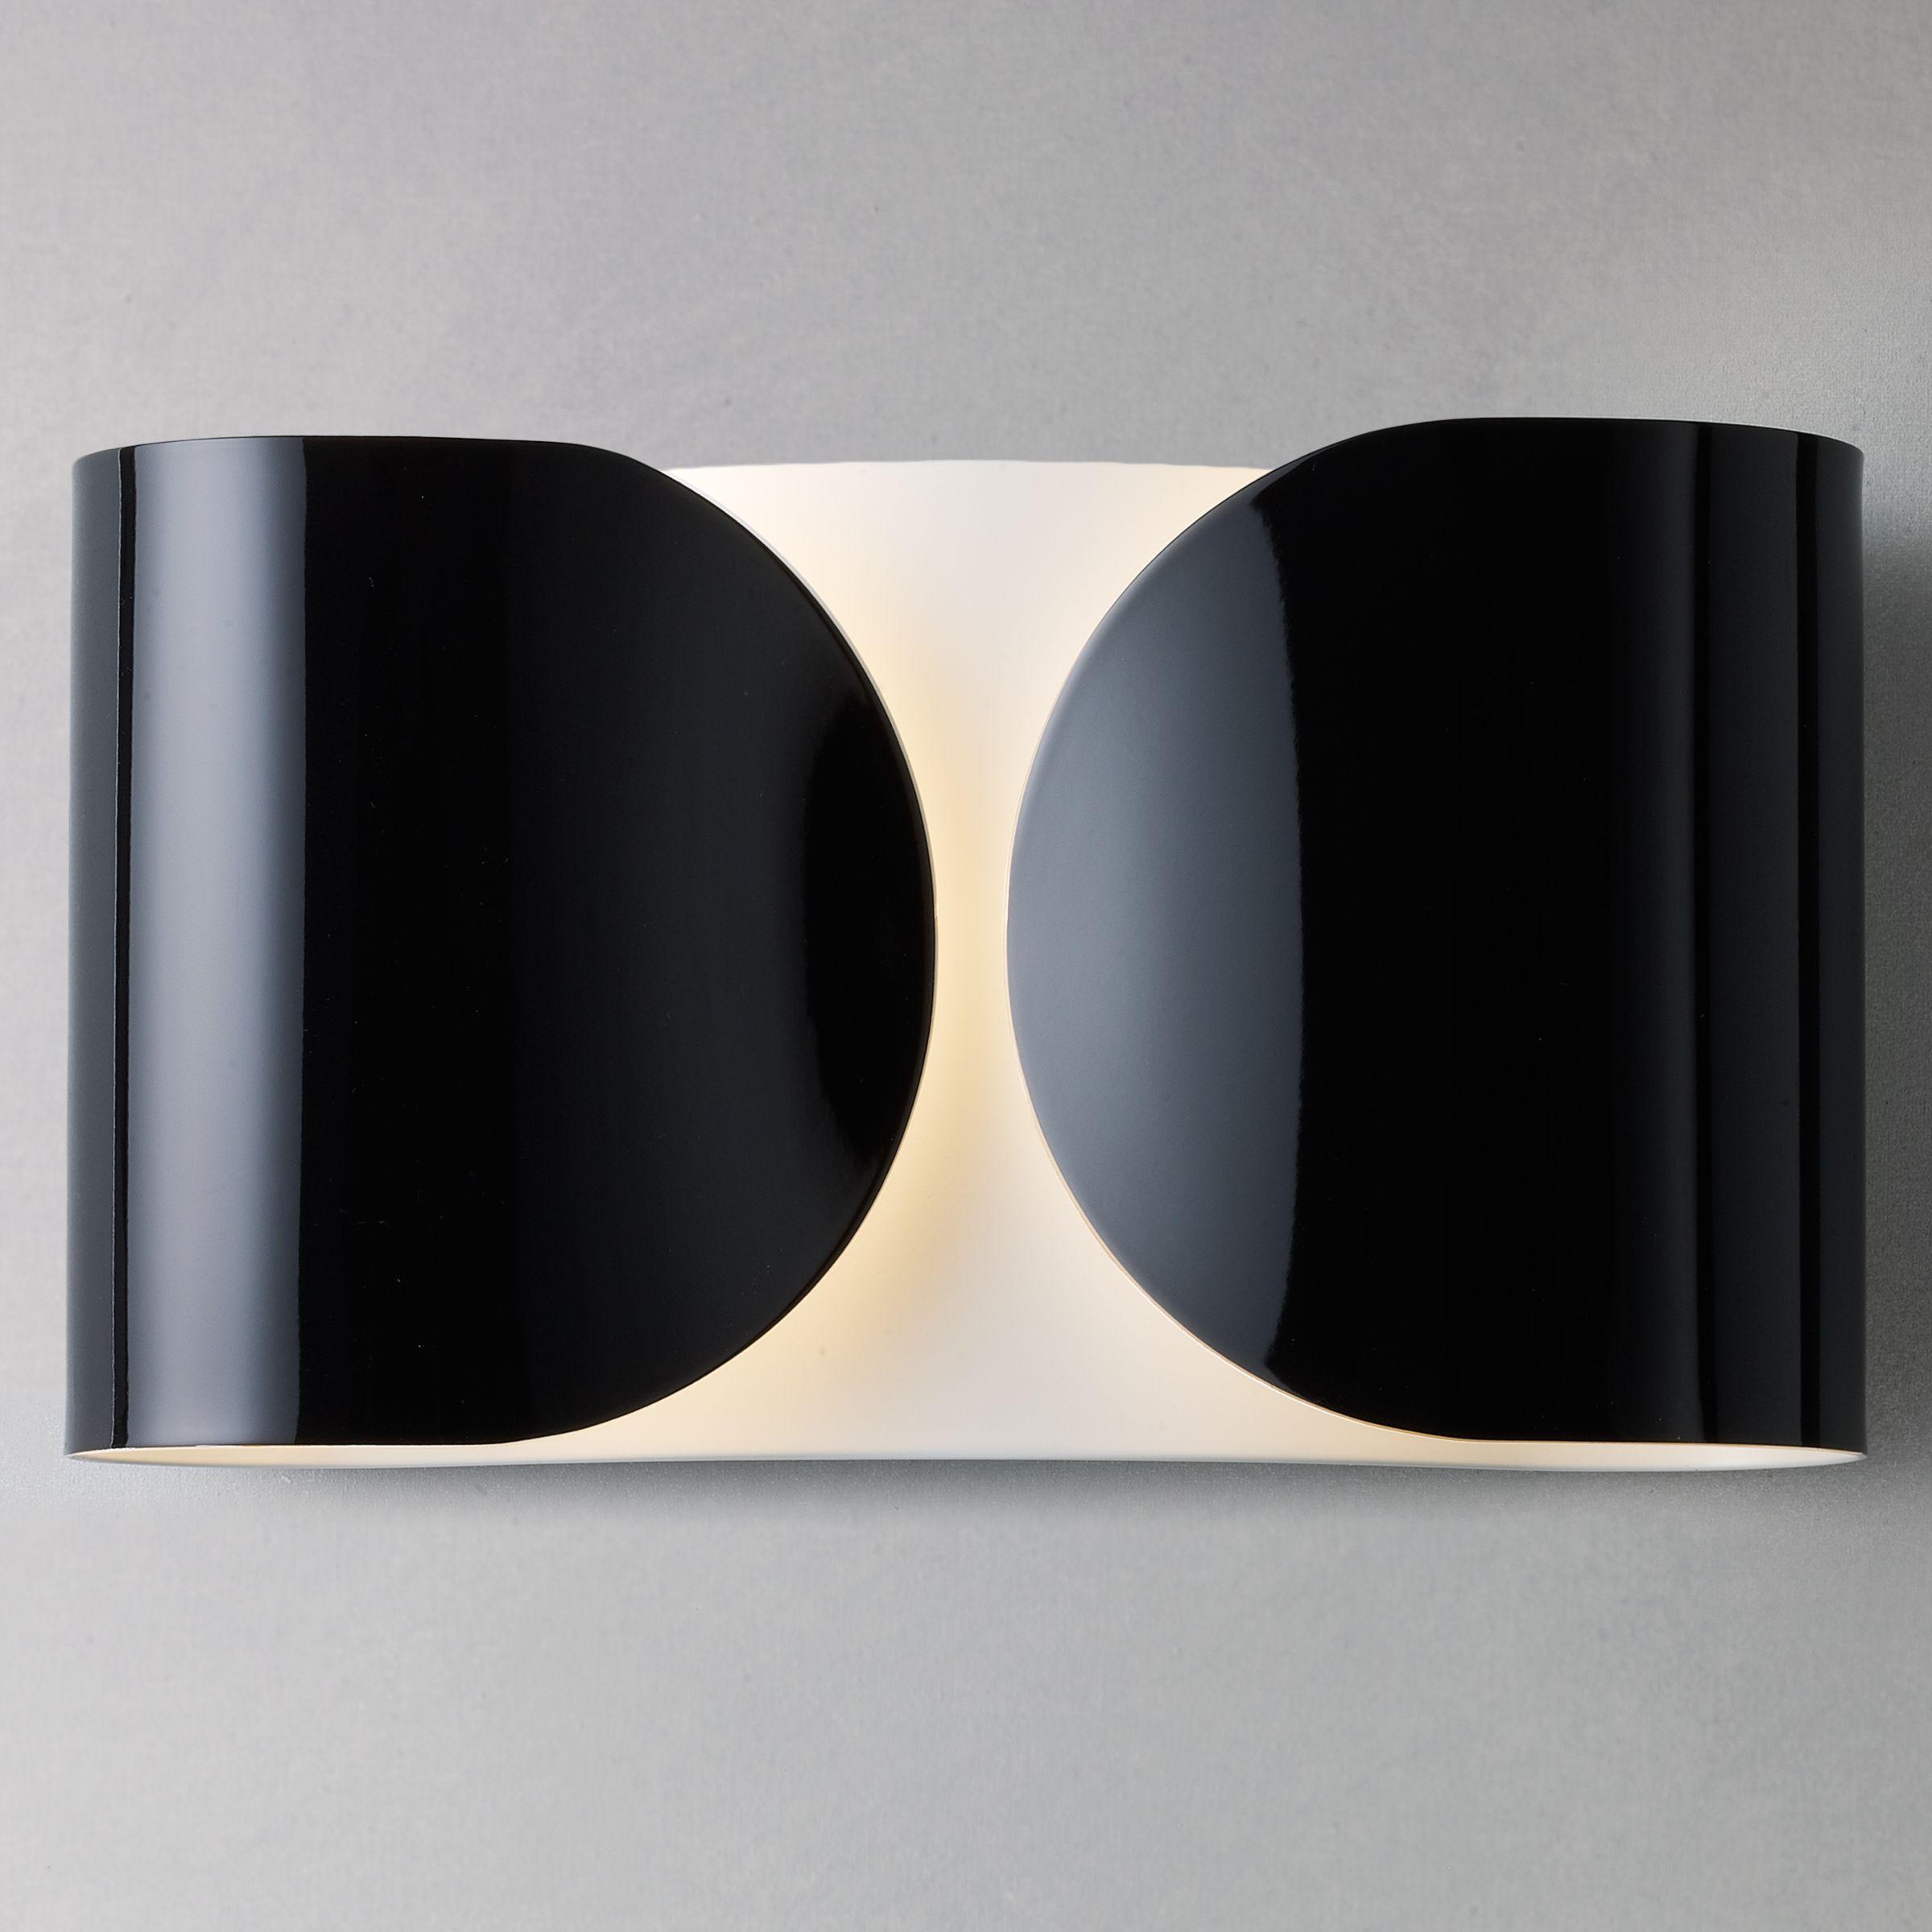 Flos Flos Foglio Wall Light